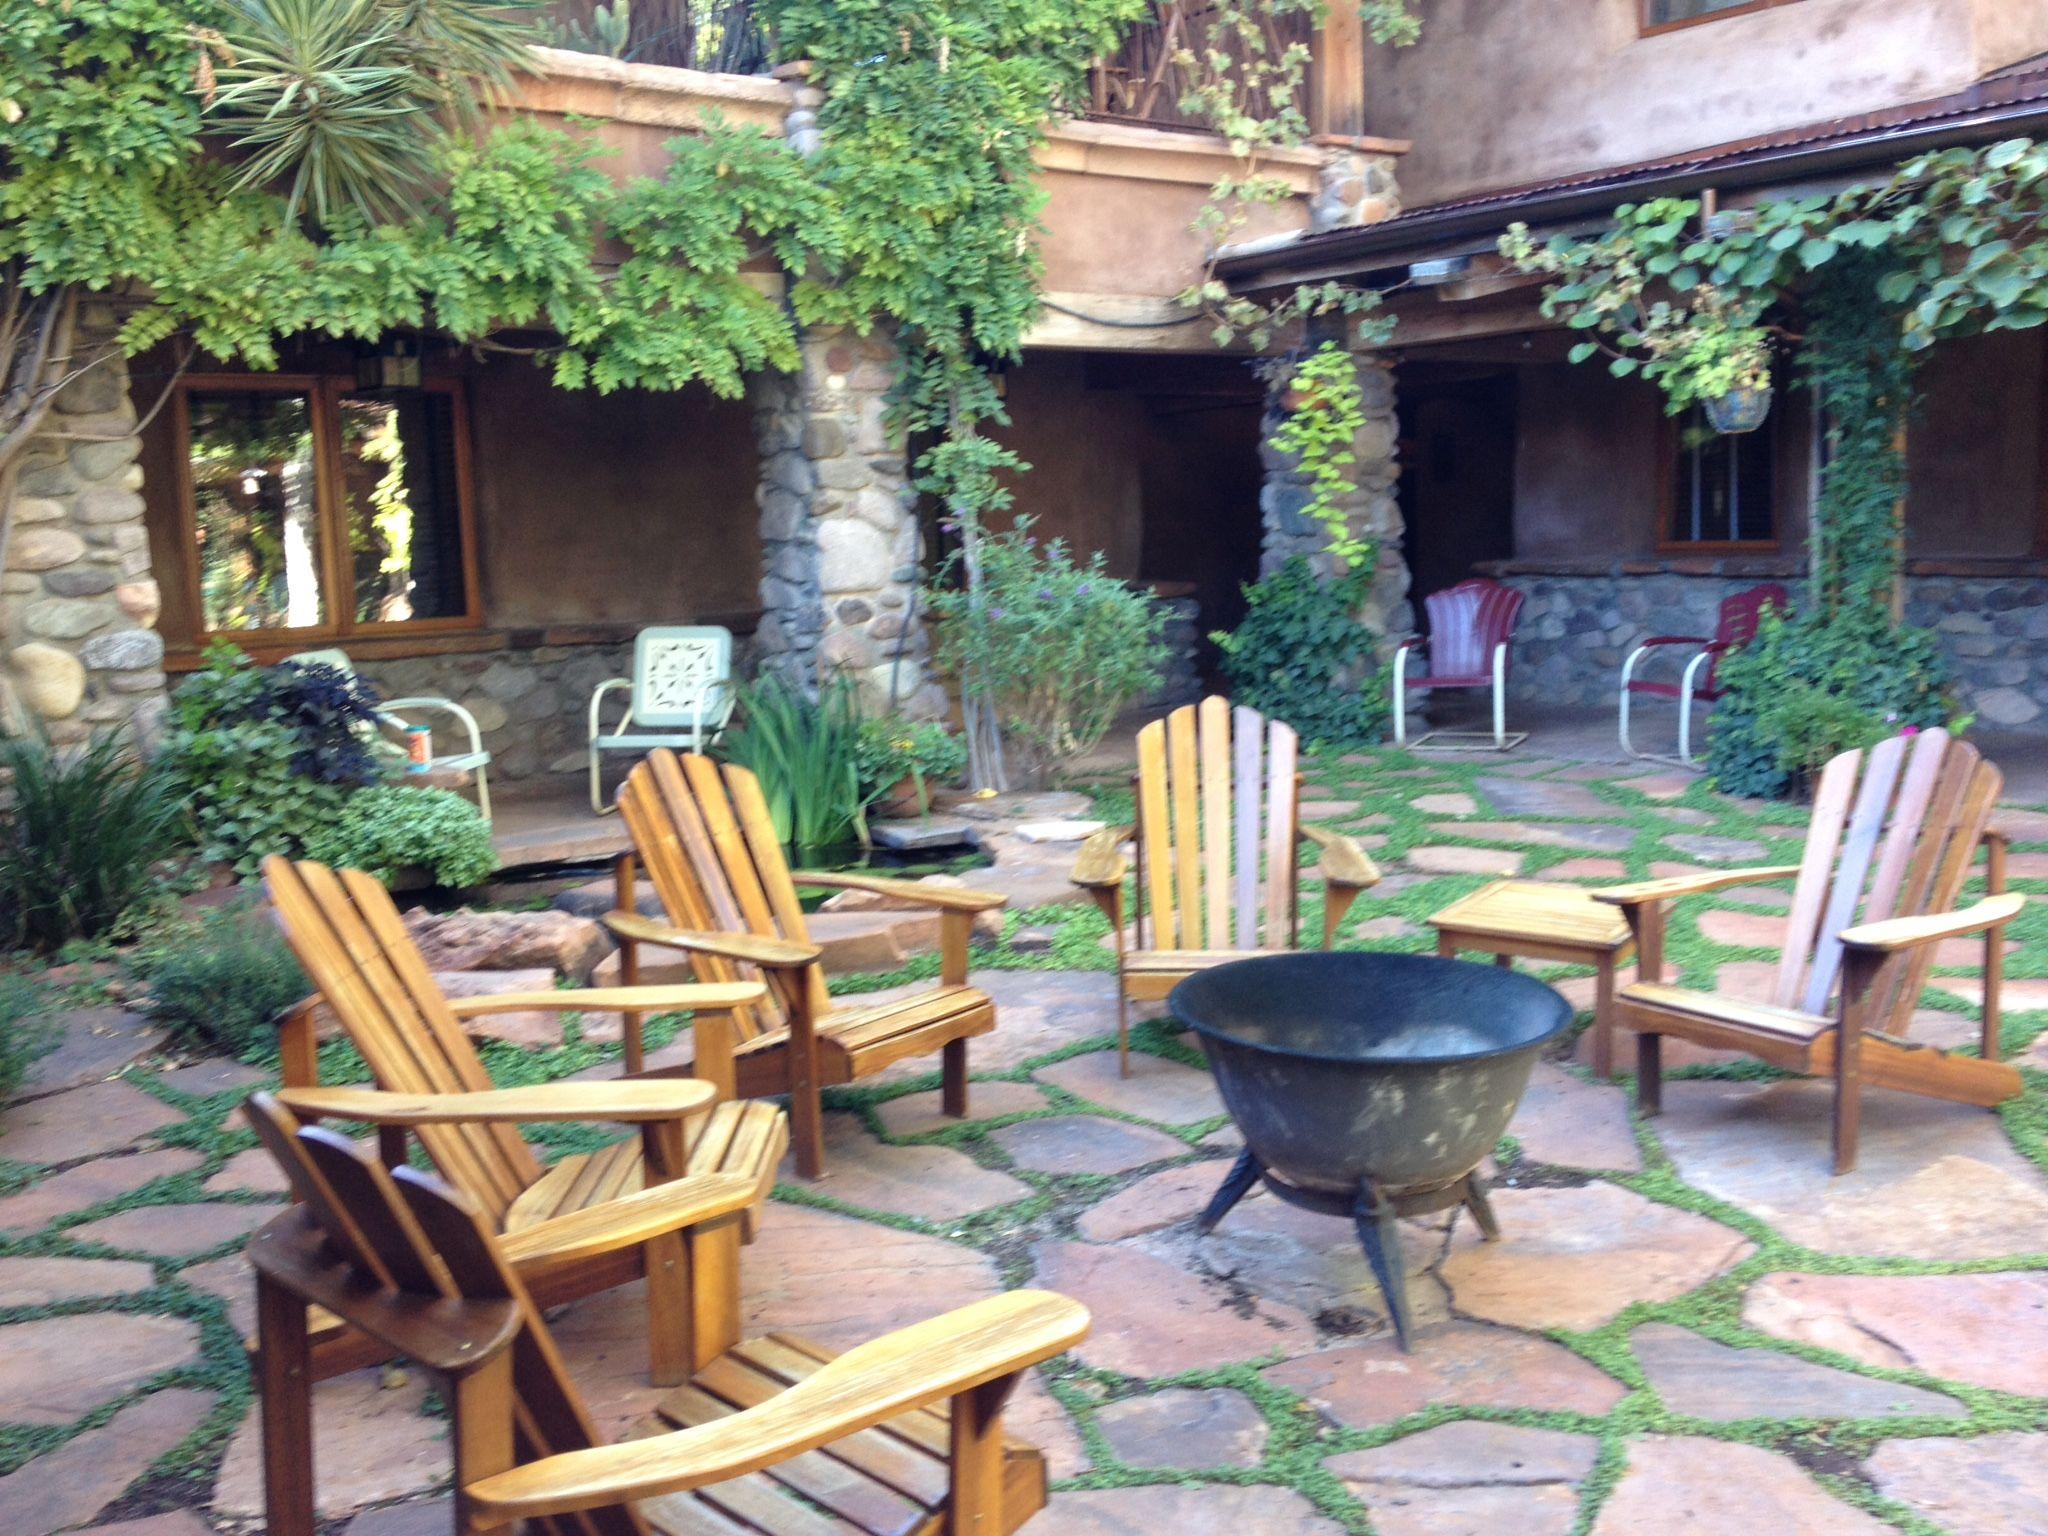 El Portal Sedona Hotel Named as Top USA Inns of by